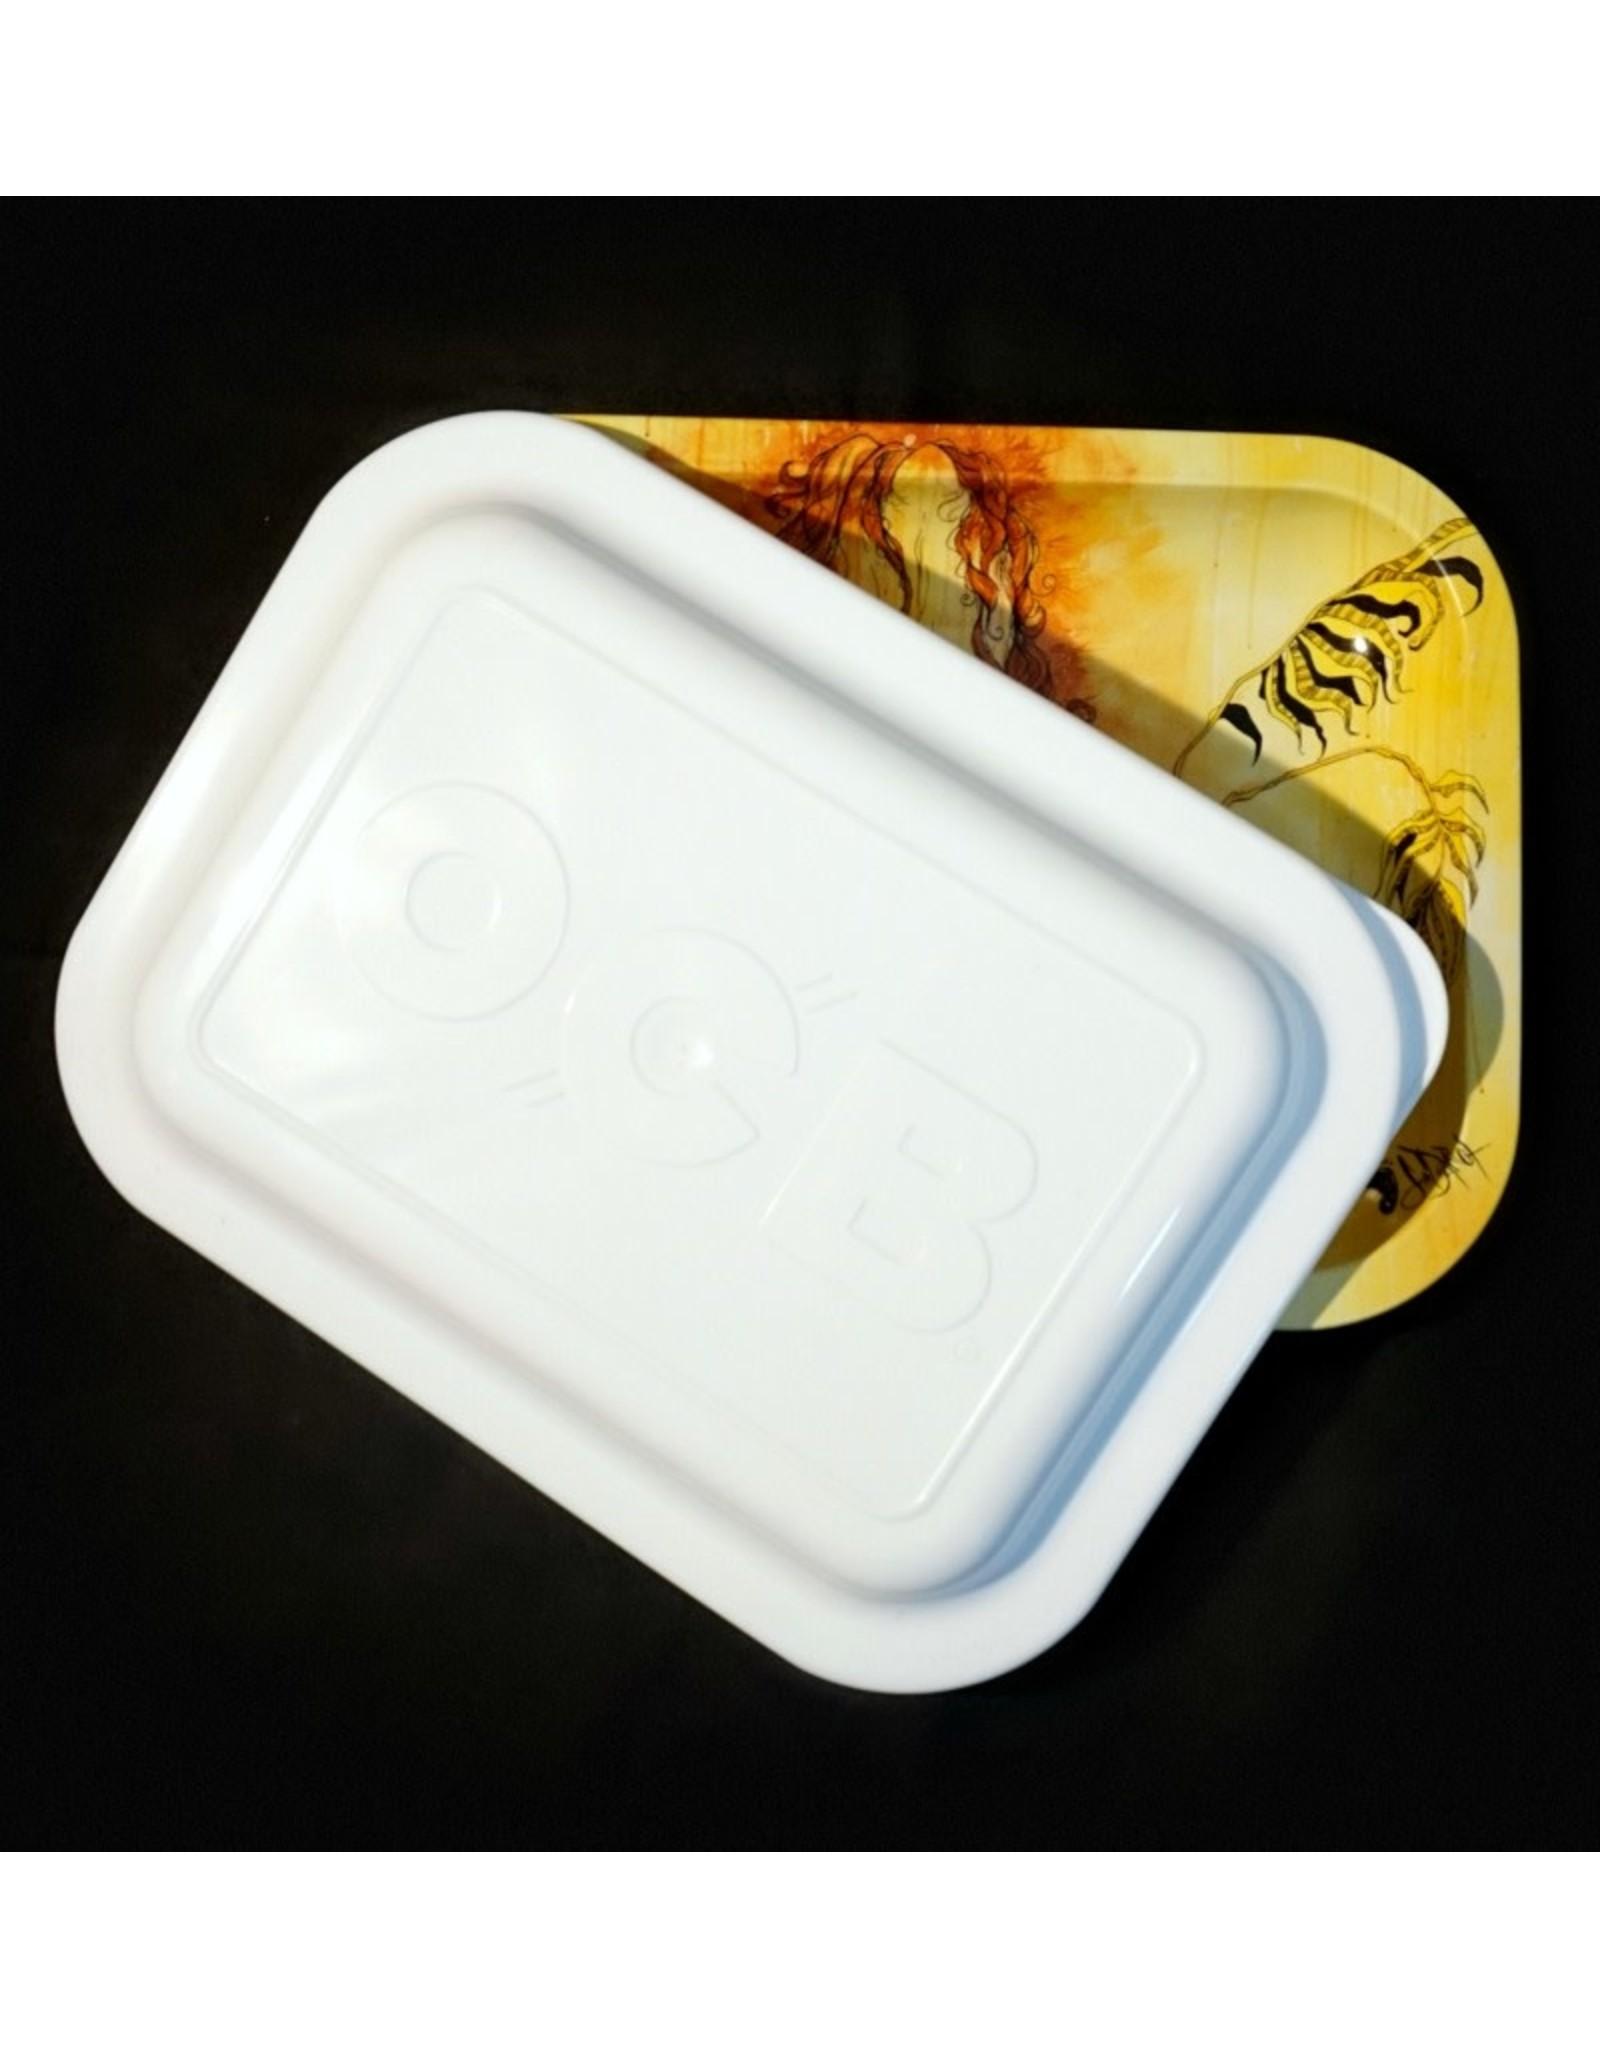 OCB OCB White Rolling Tray Lid - Small